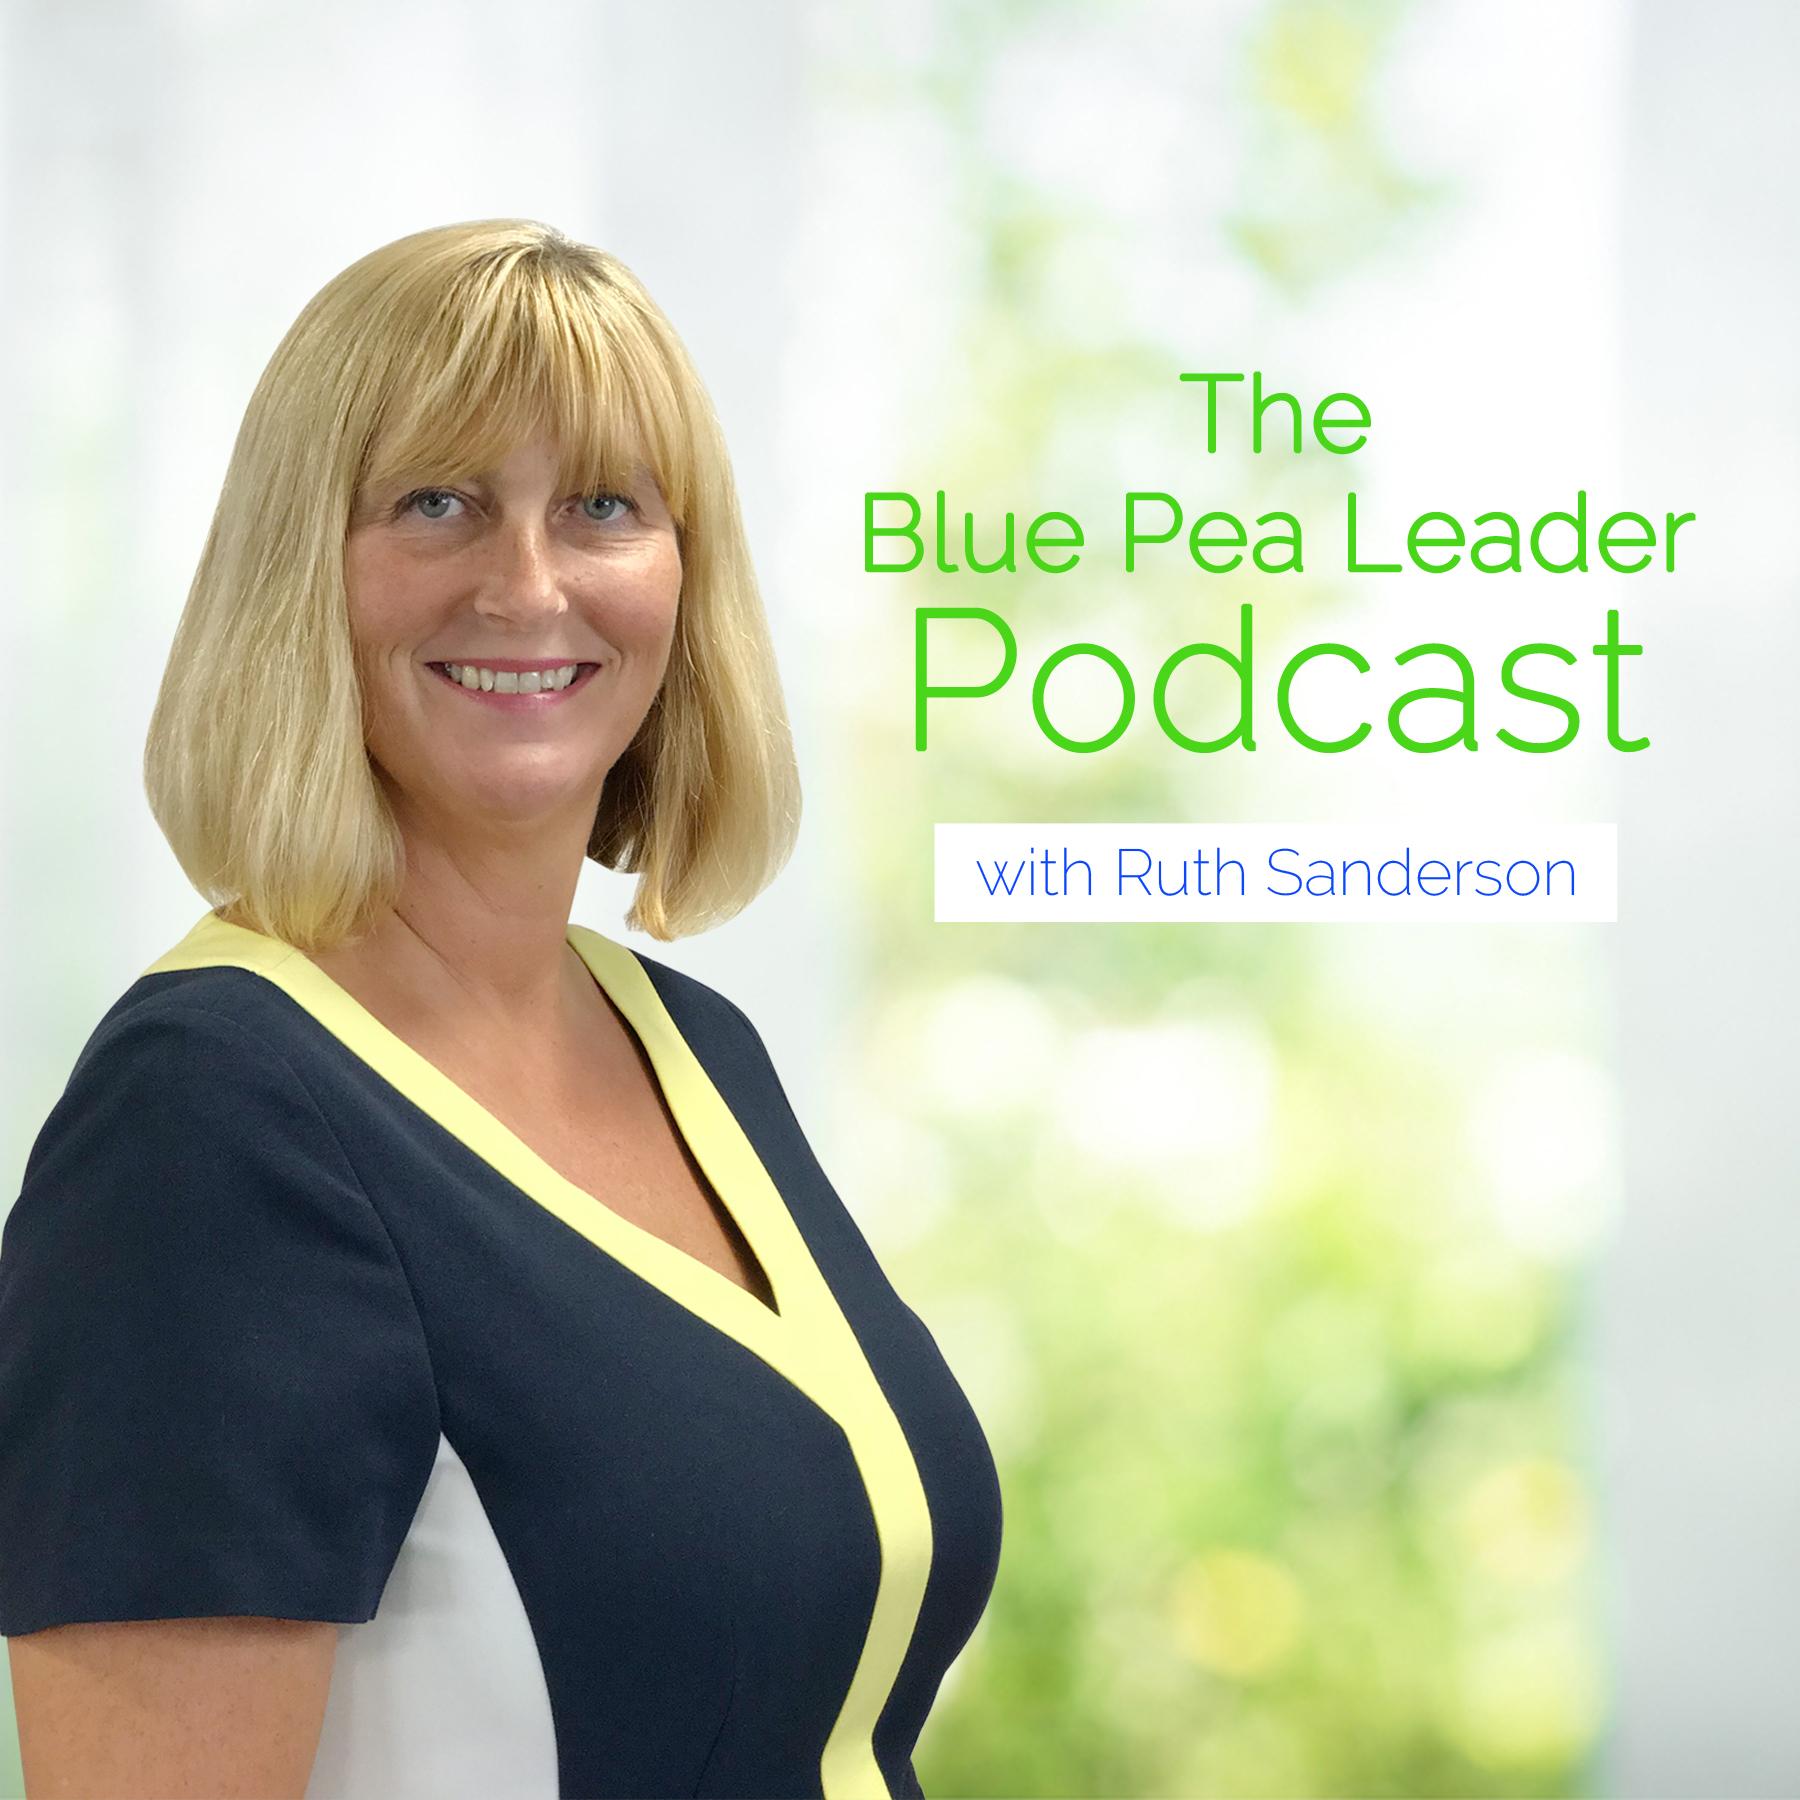 The Blue Pea Leader